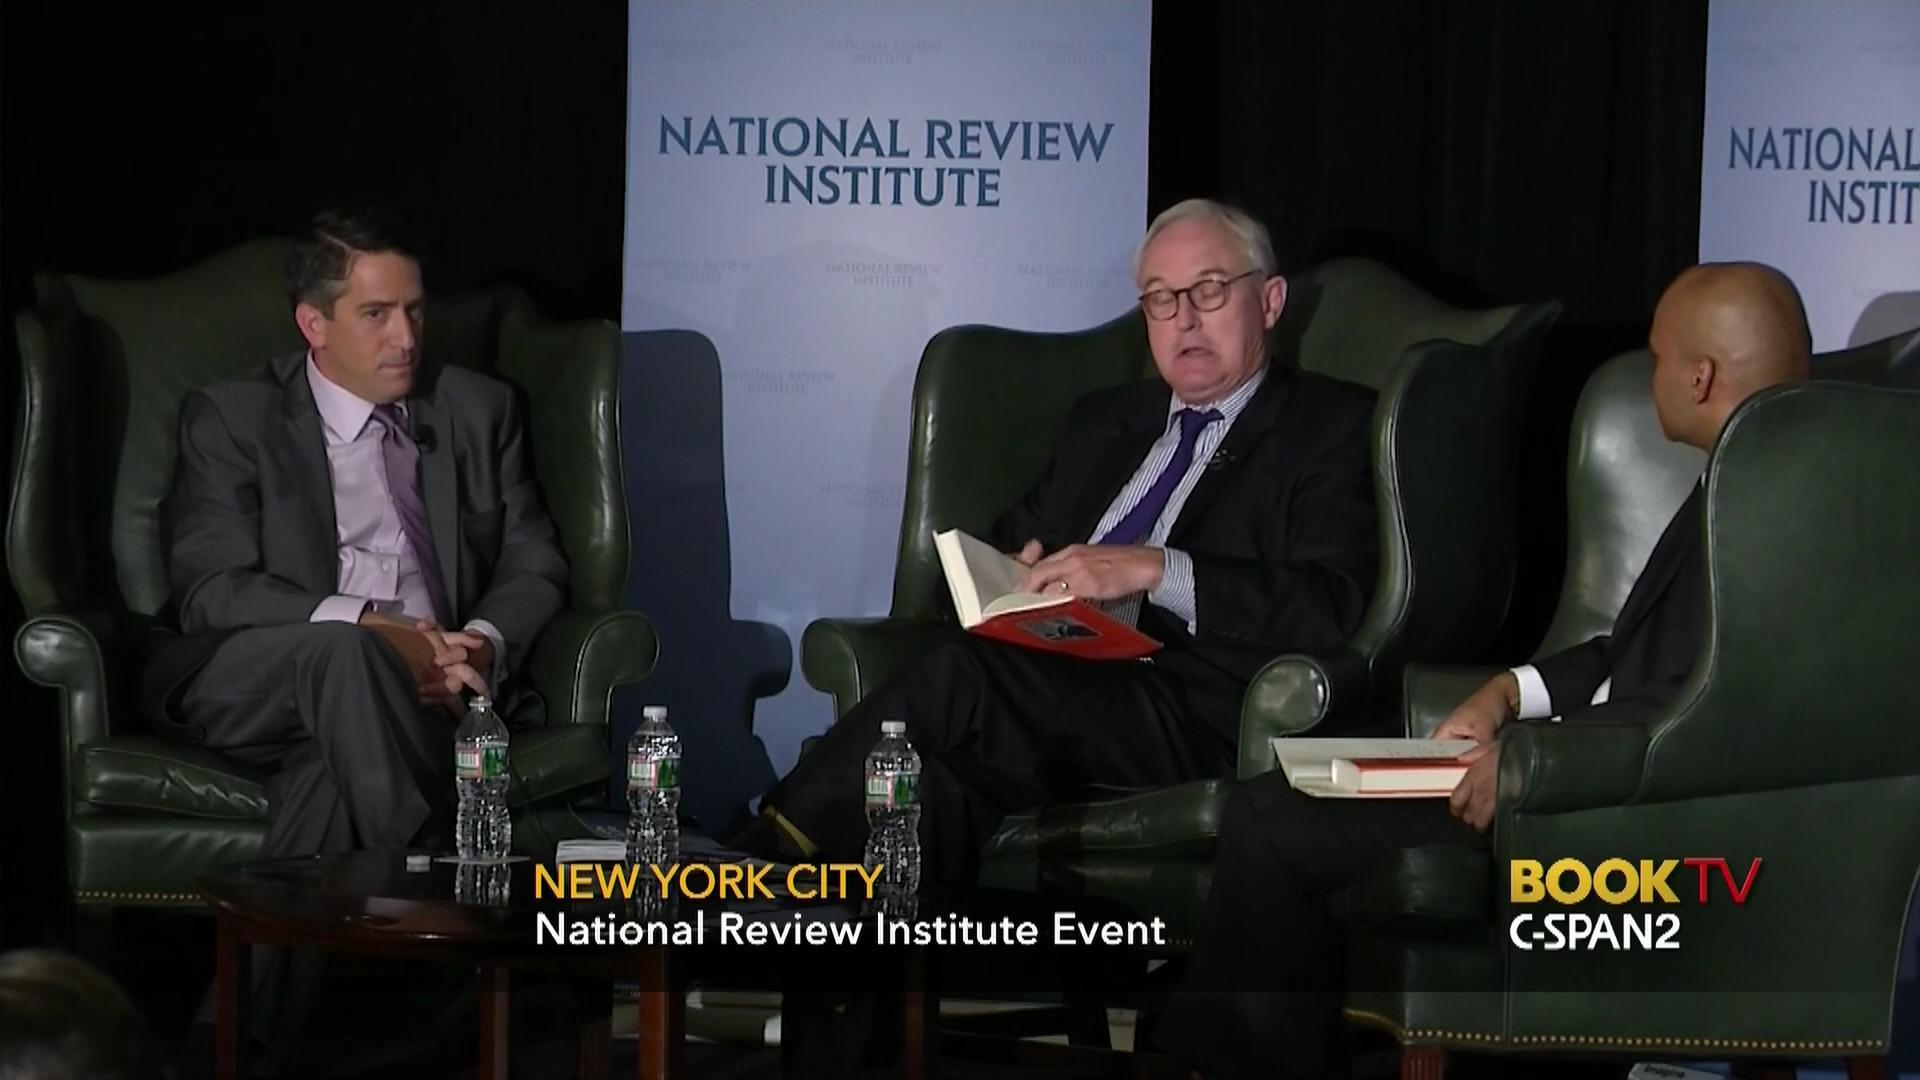 James Rosen Christopher Buckley Discuss Torch Kept Lit C SPAN Org